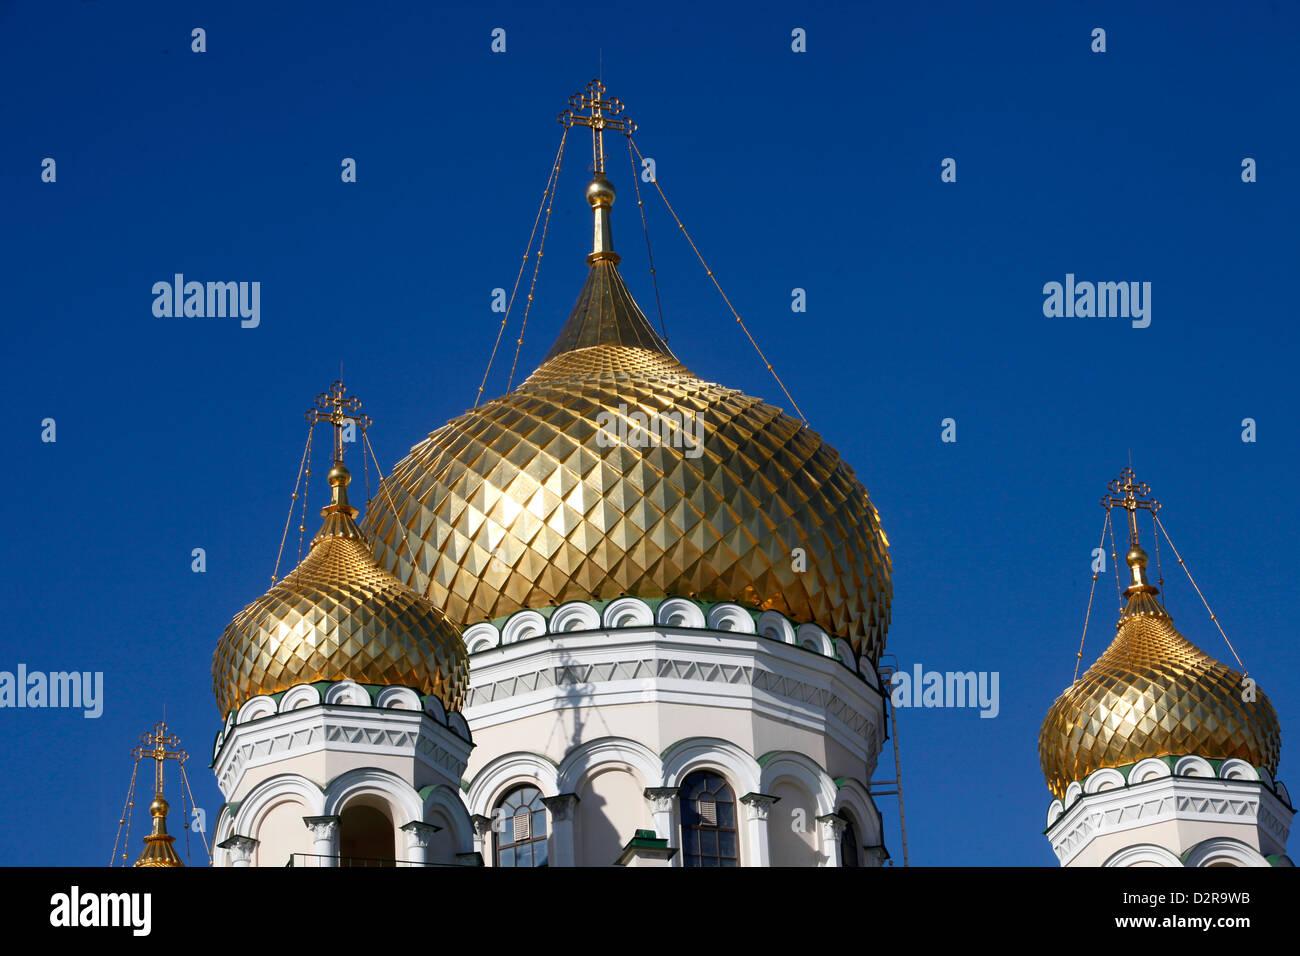 Russian Orthodox church, St. Petersburg, Russia, Europe - Stock Image